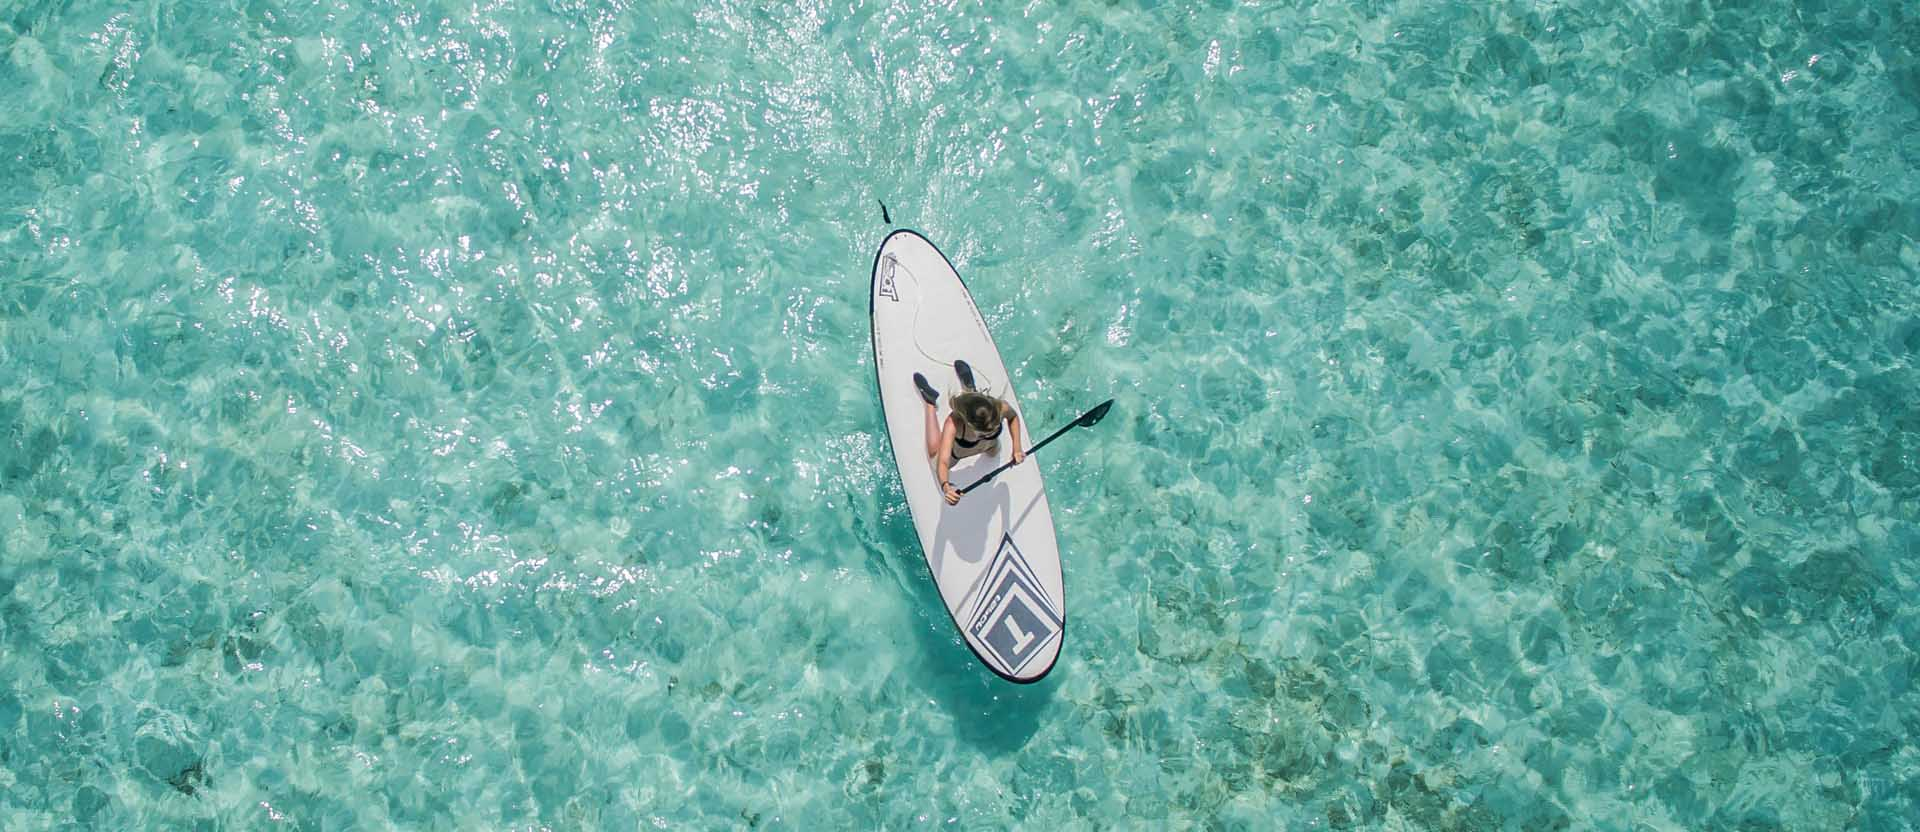 sport outdoor alle maldive